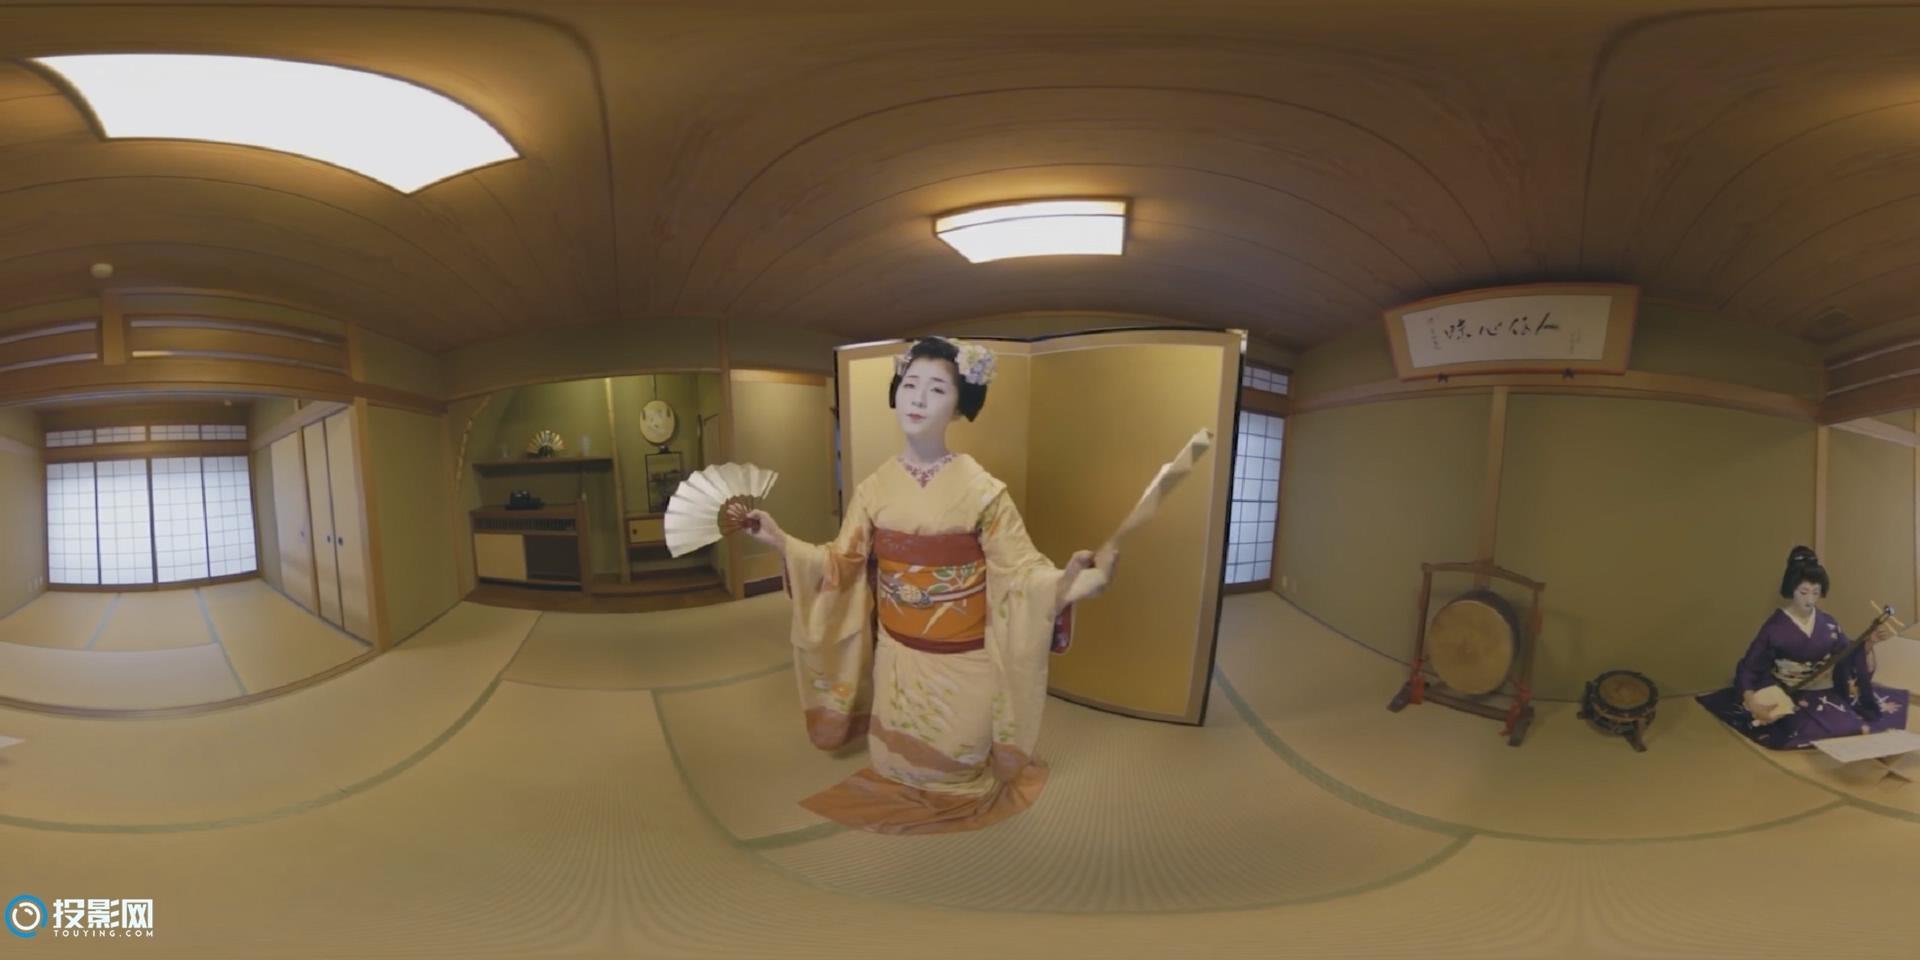 [VR360°全景] 日本创意VR短片《传统遇见未来》 [1080P/MP4/225MB]